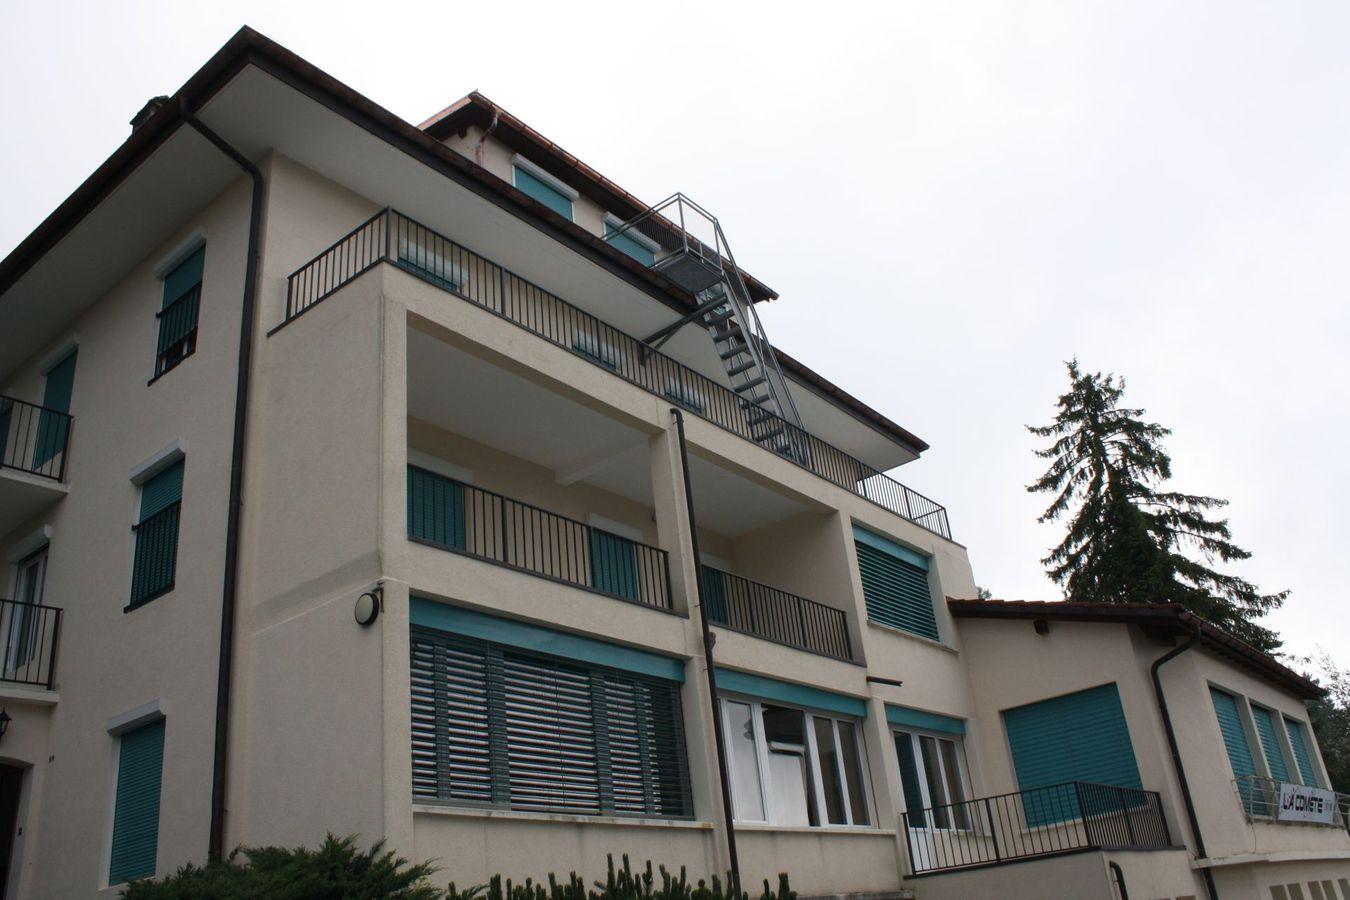 Maison La Comète, Gryon, Waadt, Gruppenunterkunft Schweiz